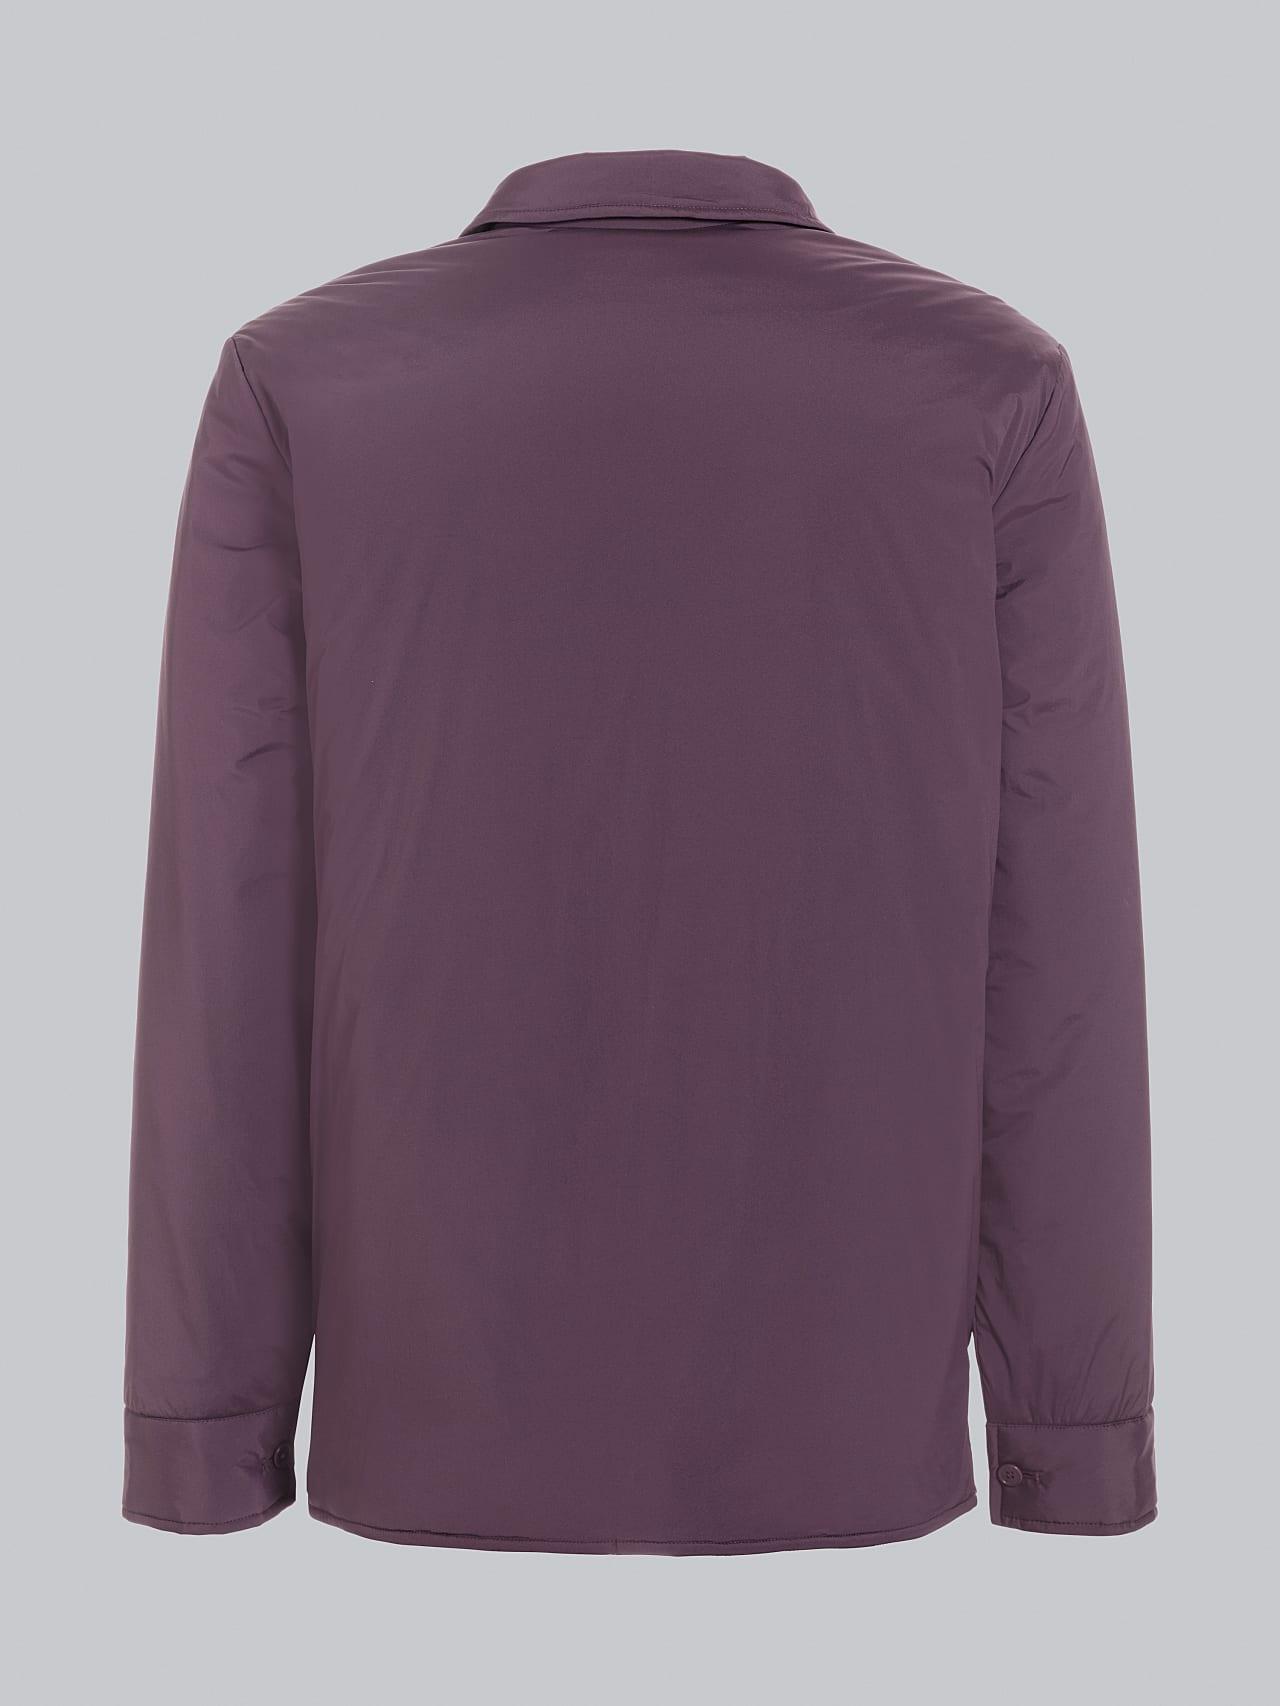 OVASU V1.Y5.02 PrimaLoft® Overshirt Jacket Burgundy Left Alpha Tauri